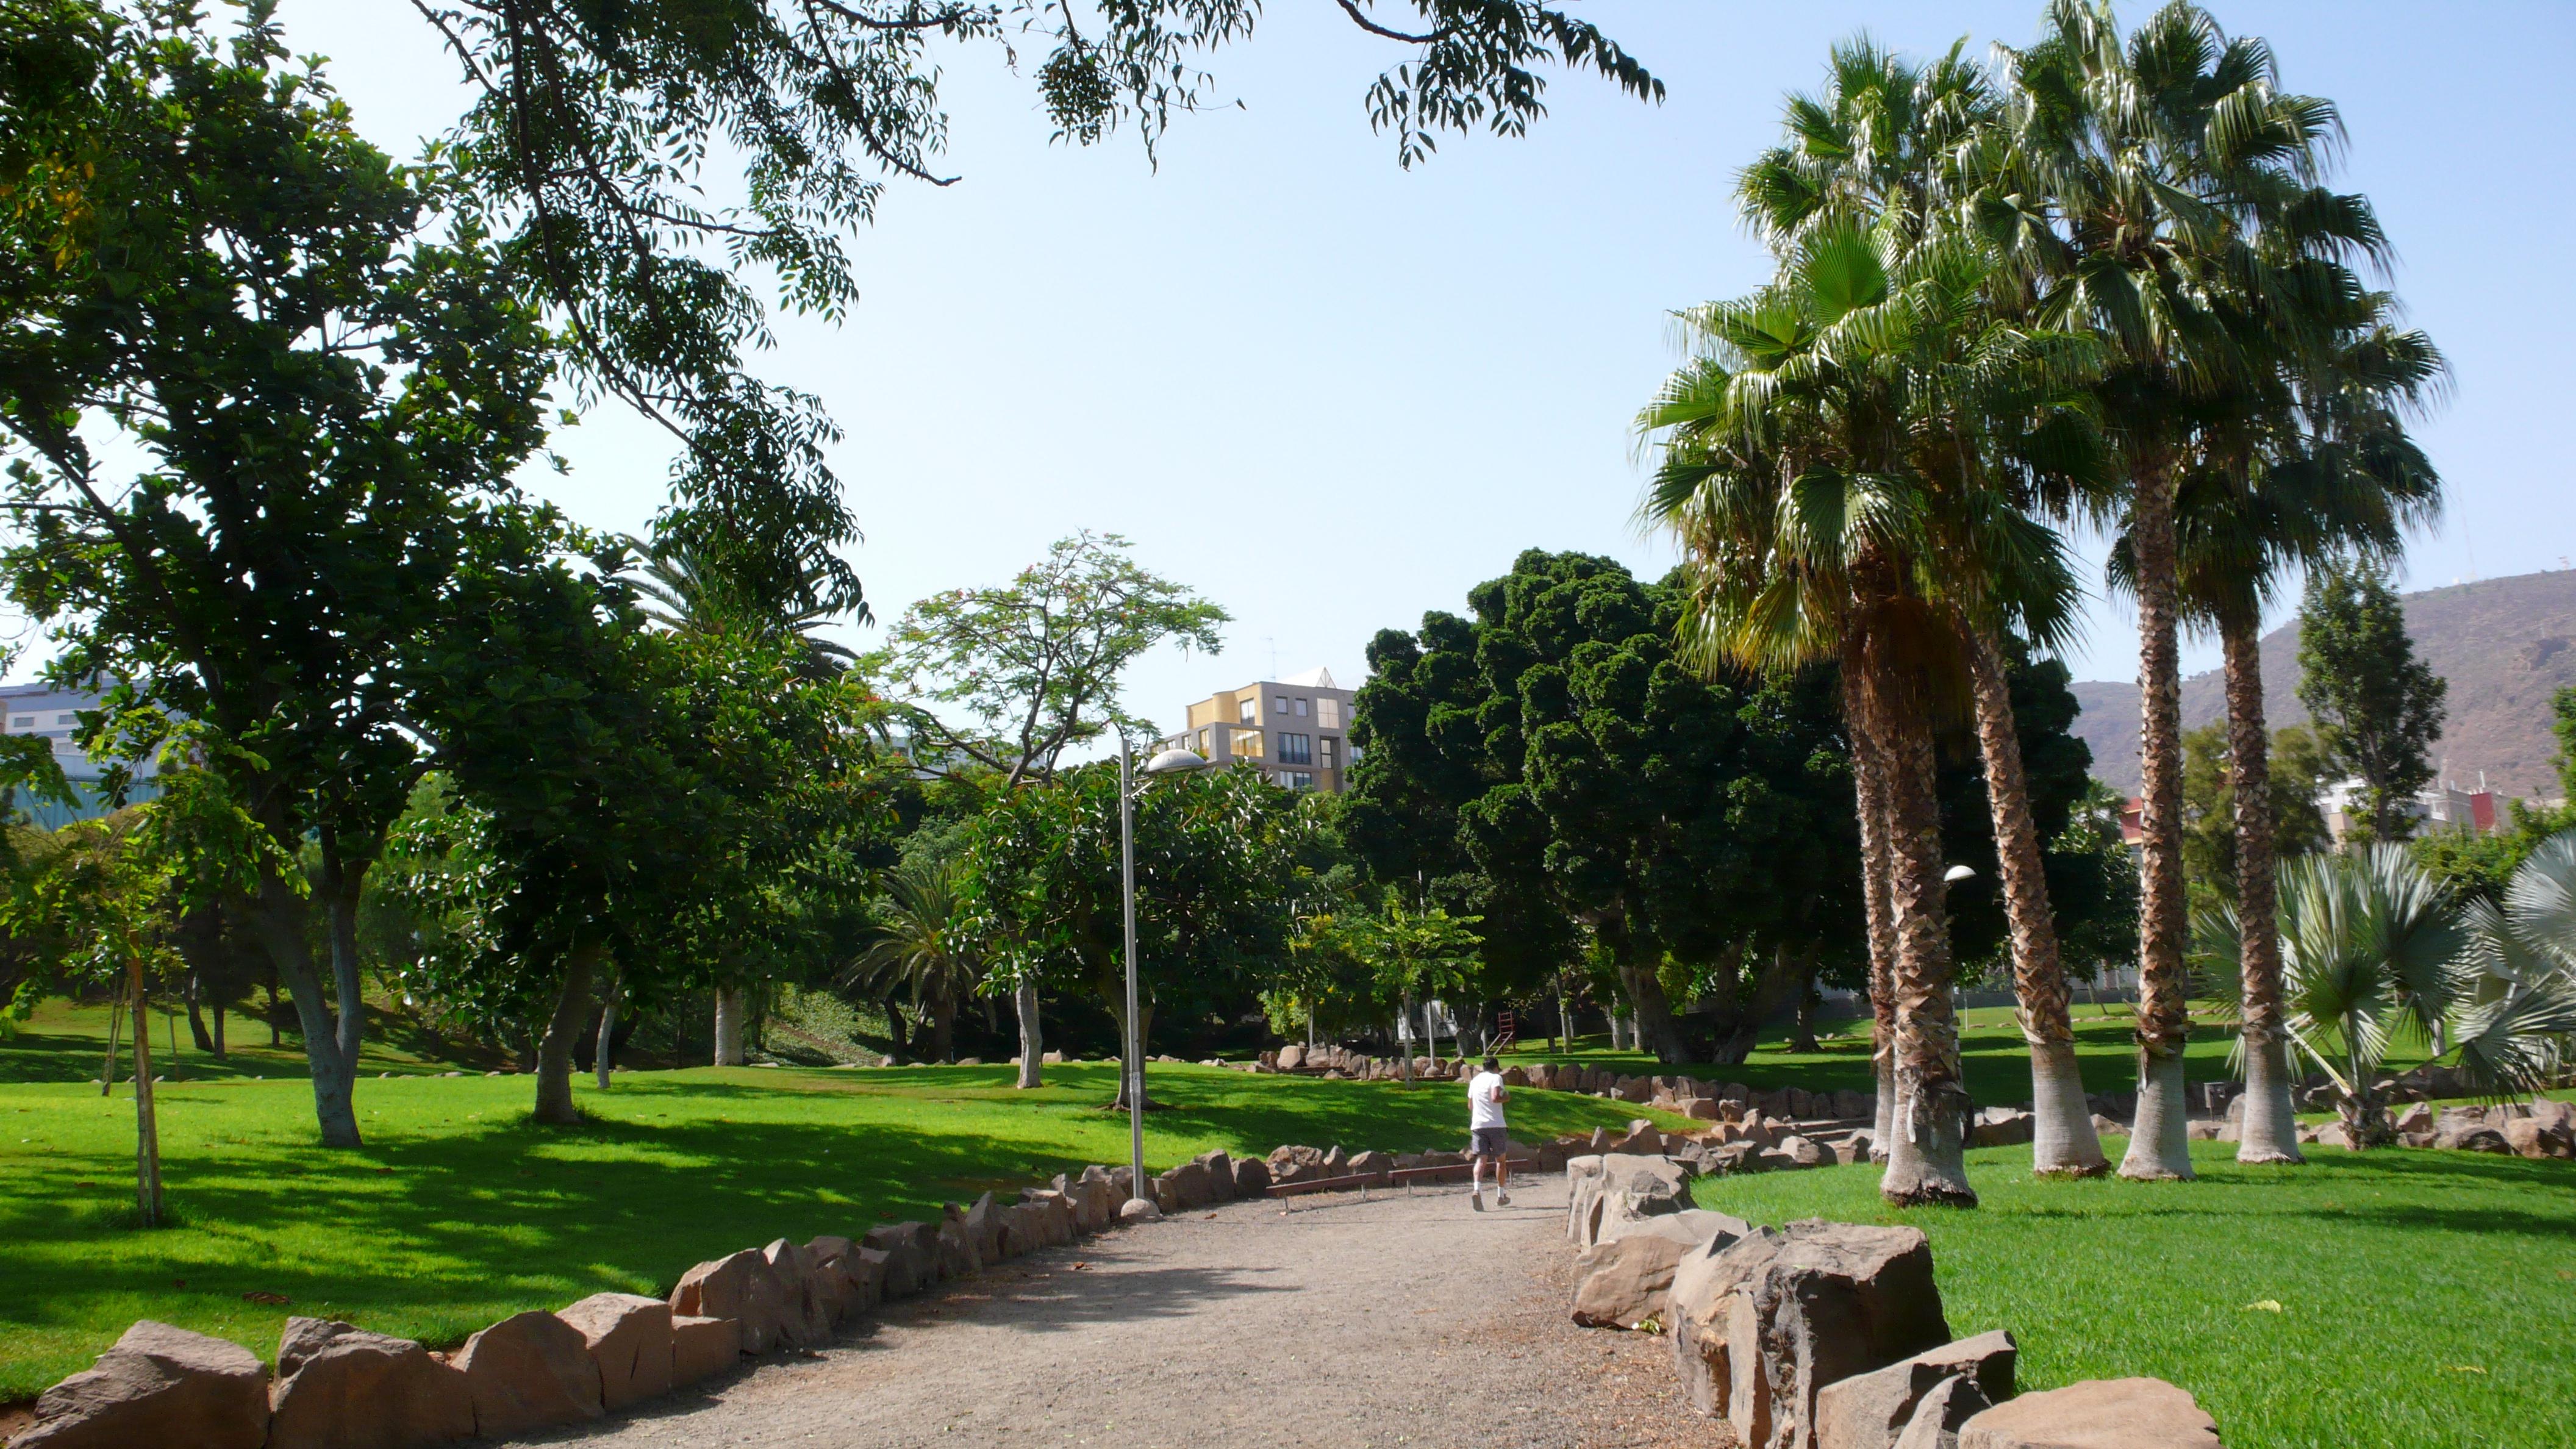 File parque la granja jpg wikimedia commons - Parques infantiles en santa cruz de tenerife ...